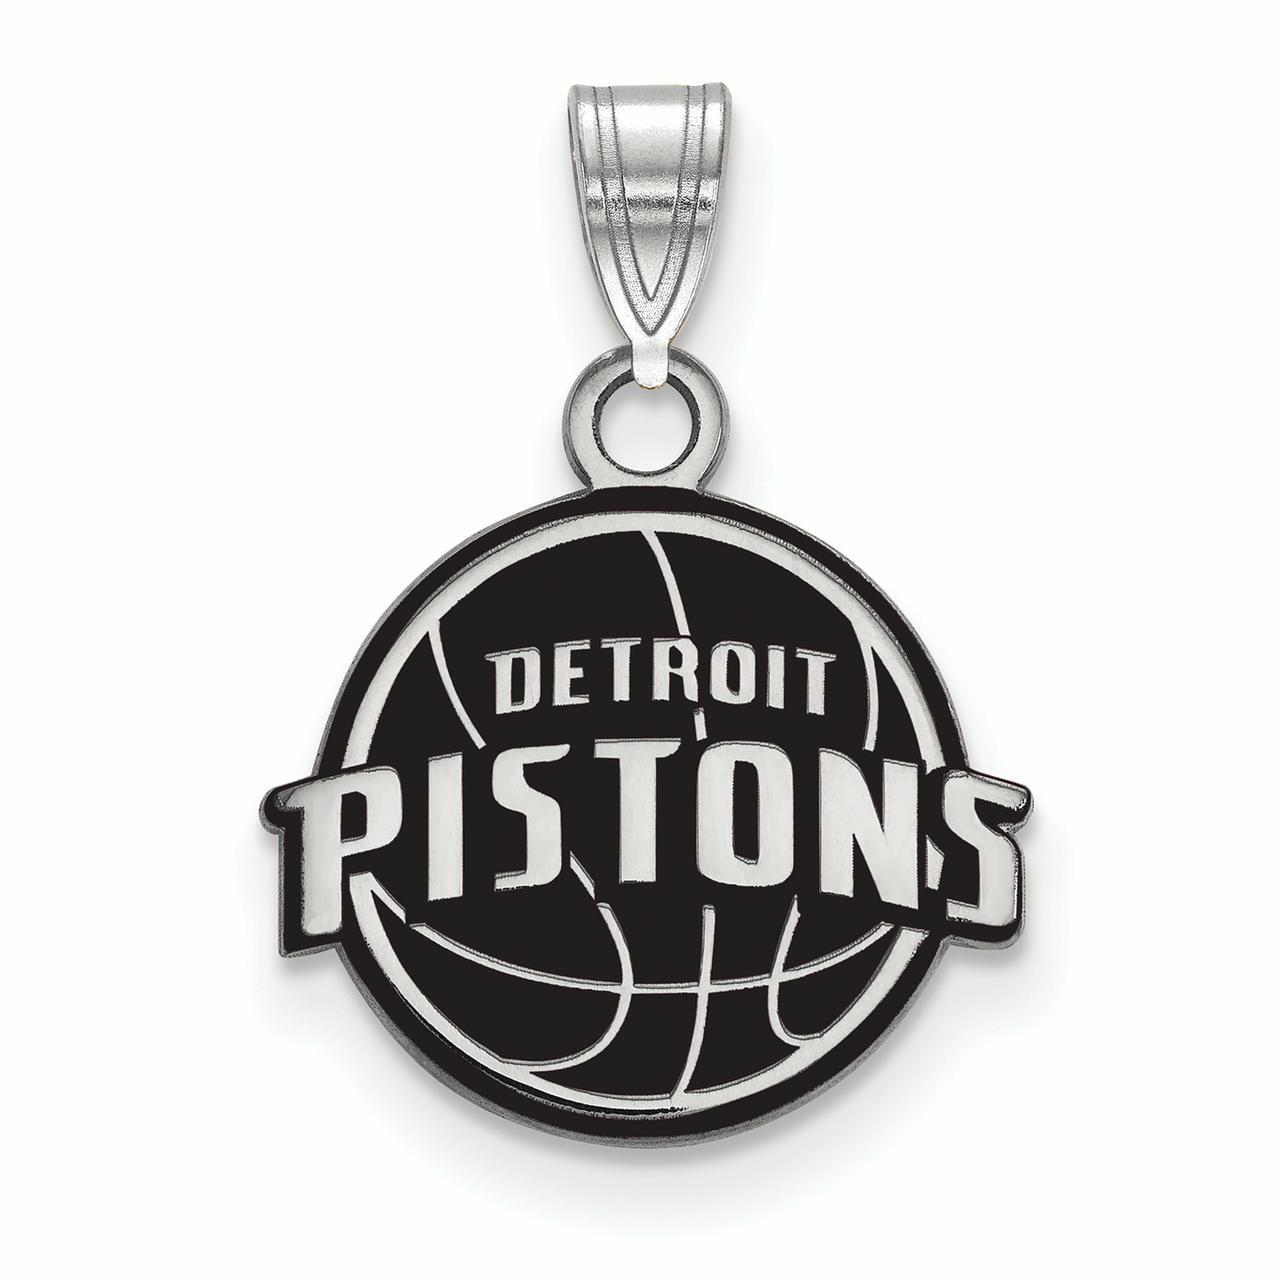 Detroit Pistons Women's Sterling Silver Small Enamel Pendant - No Size